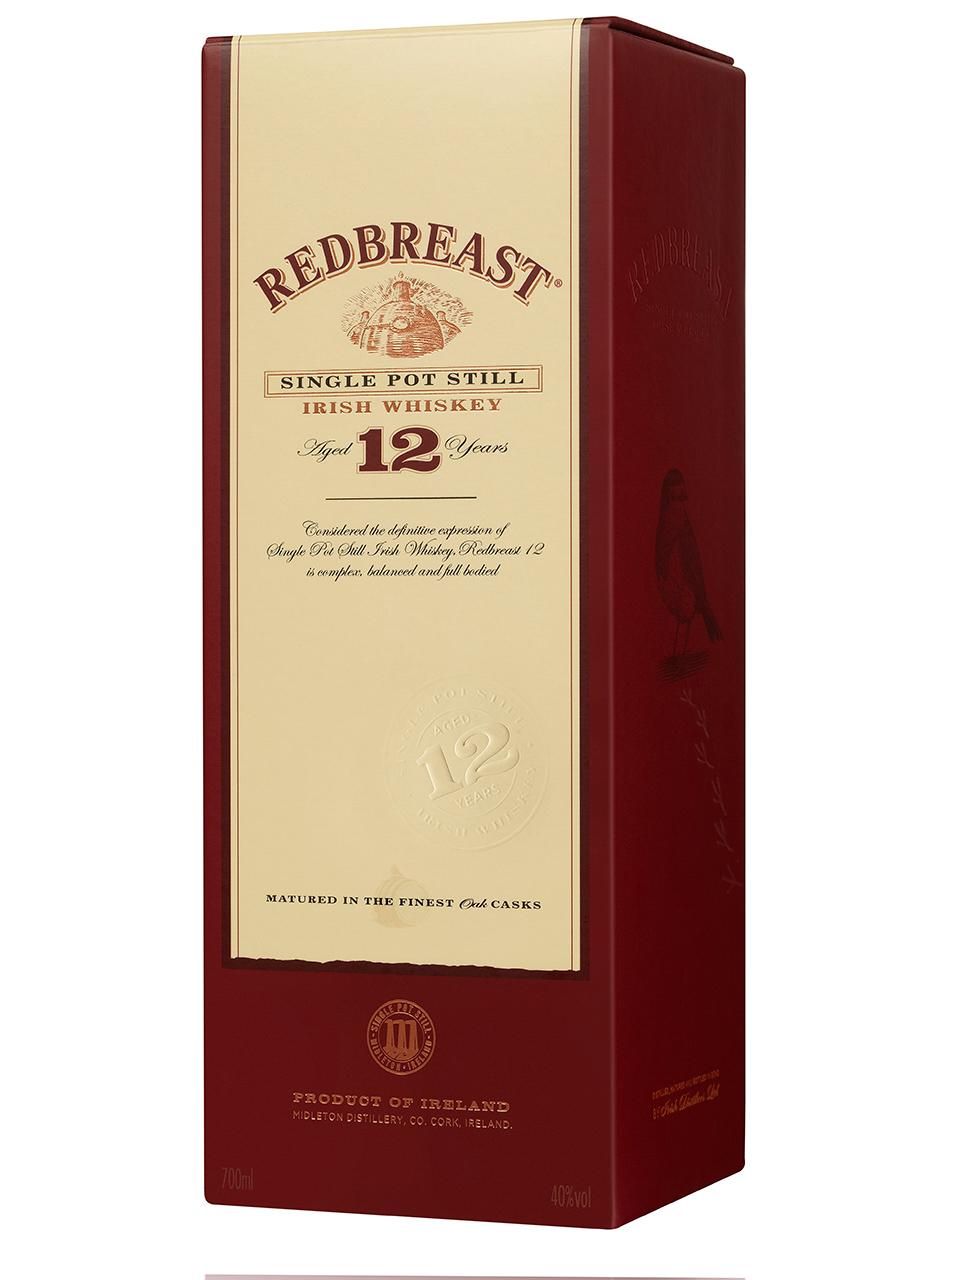 Redbreast 12YO Single Pot Still Irish Whisky